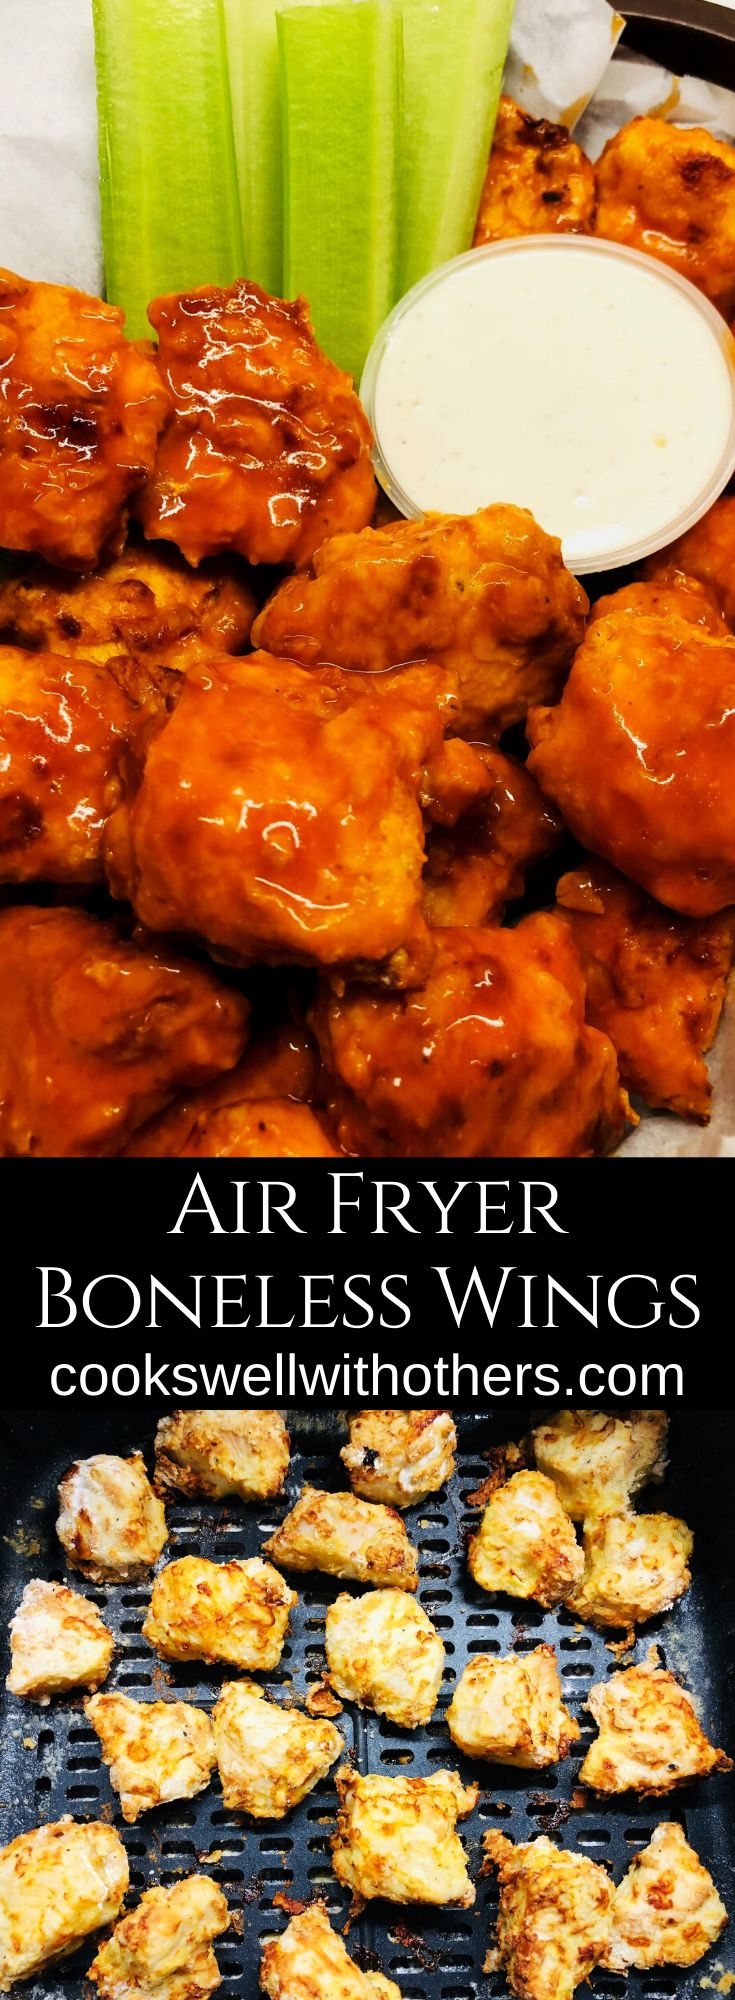 Air fryer boneless wings boneless wings boneless